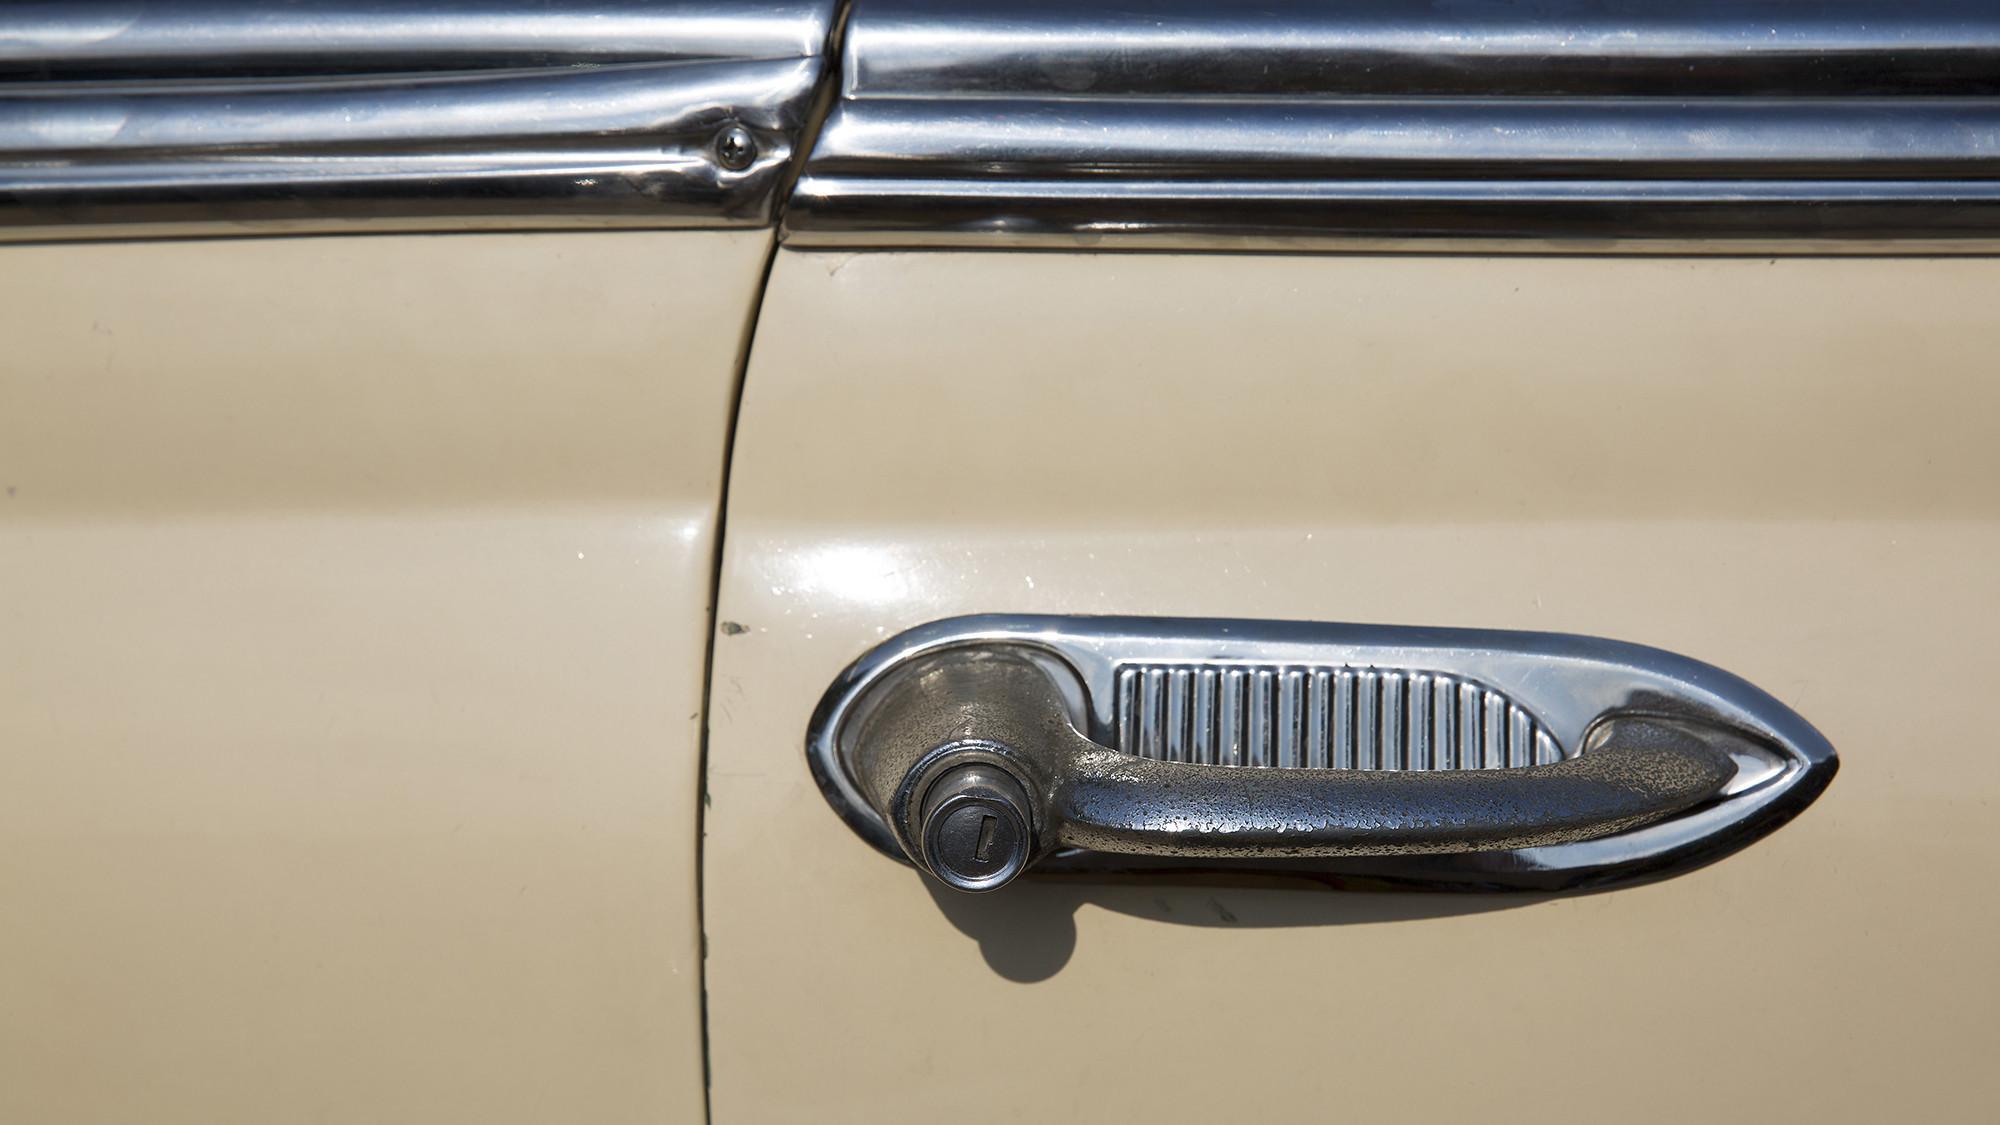 vintage car door handles. Vintage Car Door Handles Cuba Cars - Los Angeles Times